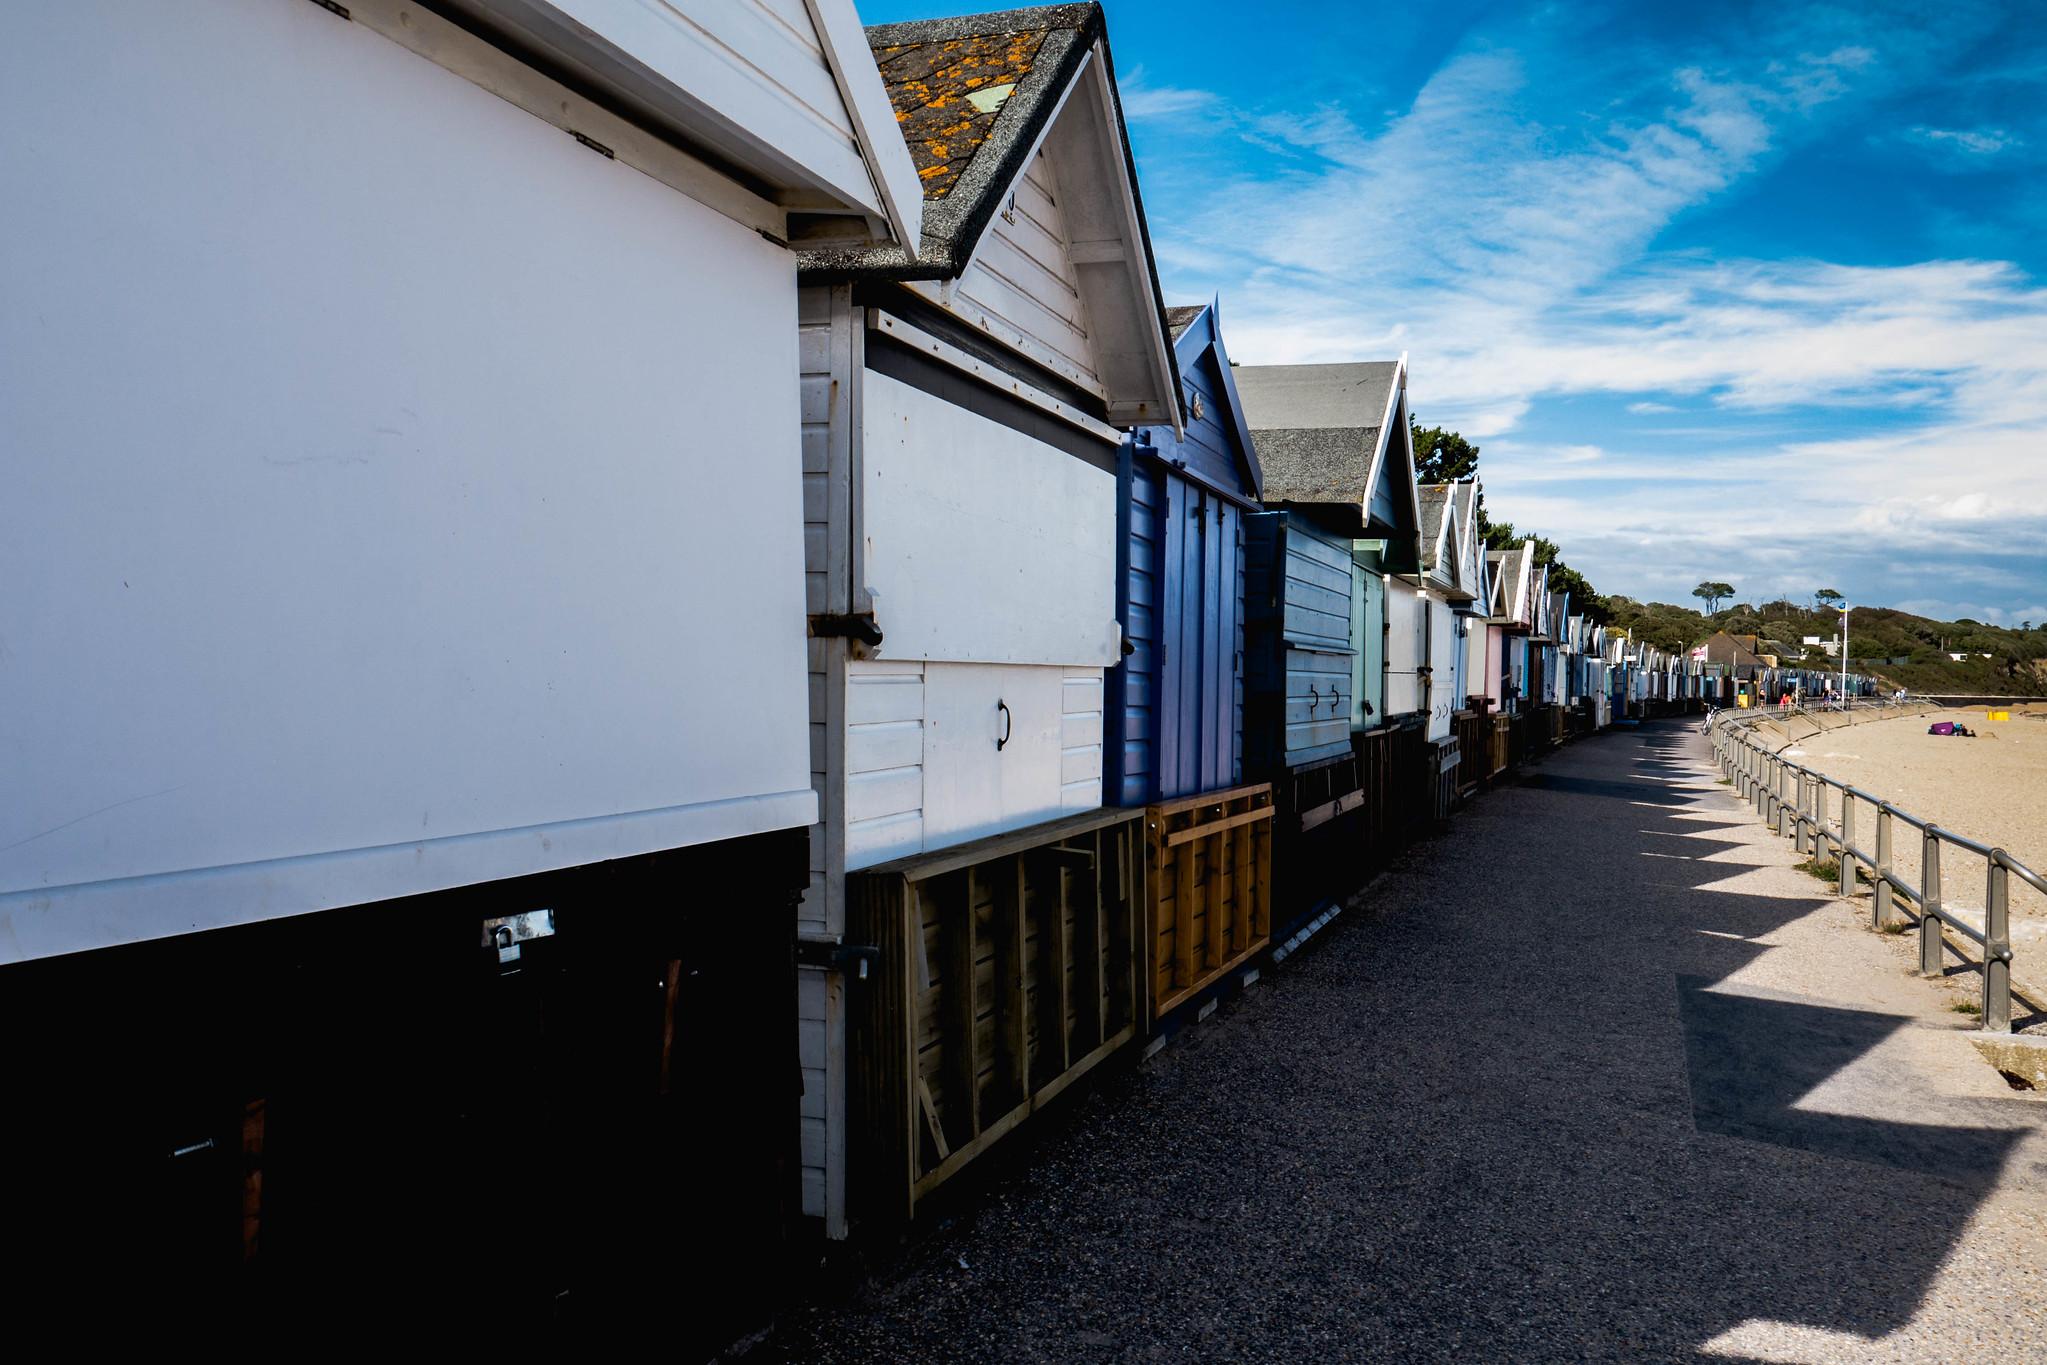 Beach Huts at Mudeford